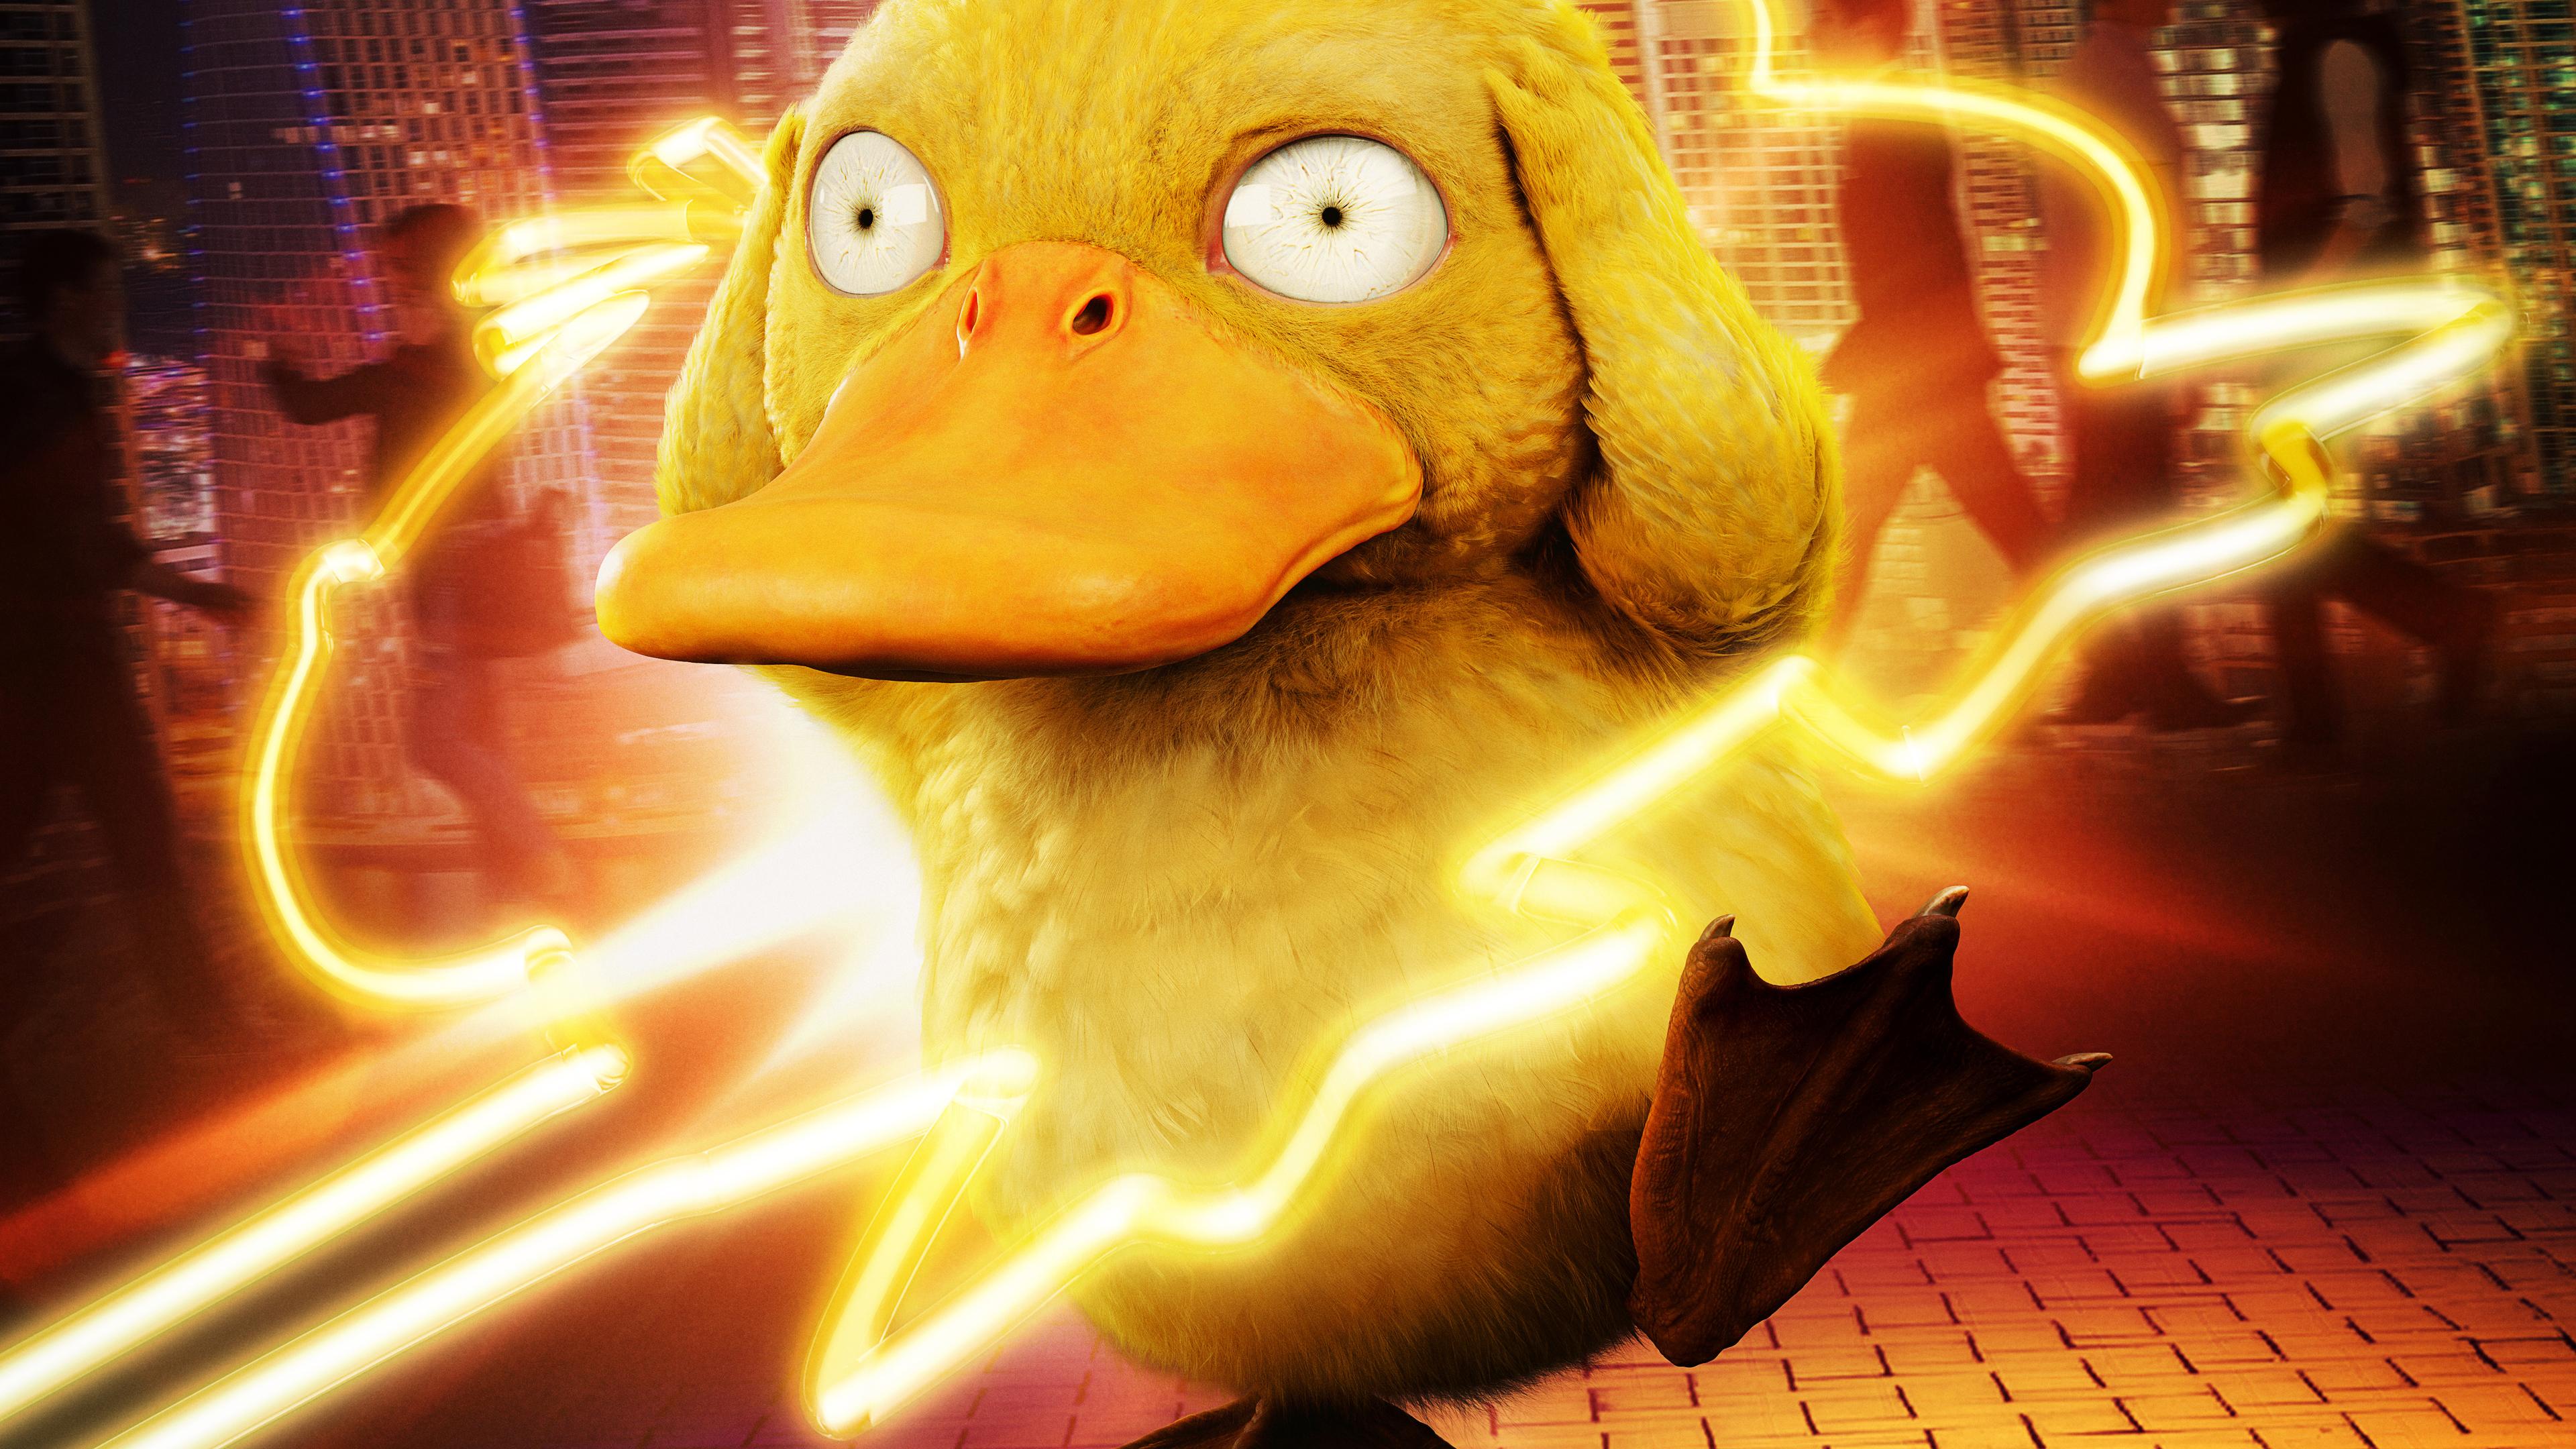 Wallpaper 4k Detective Pikachu Koda Duck 4k 2019 Movies